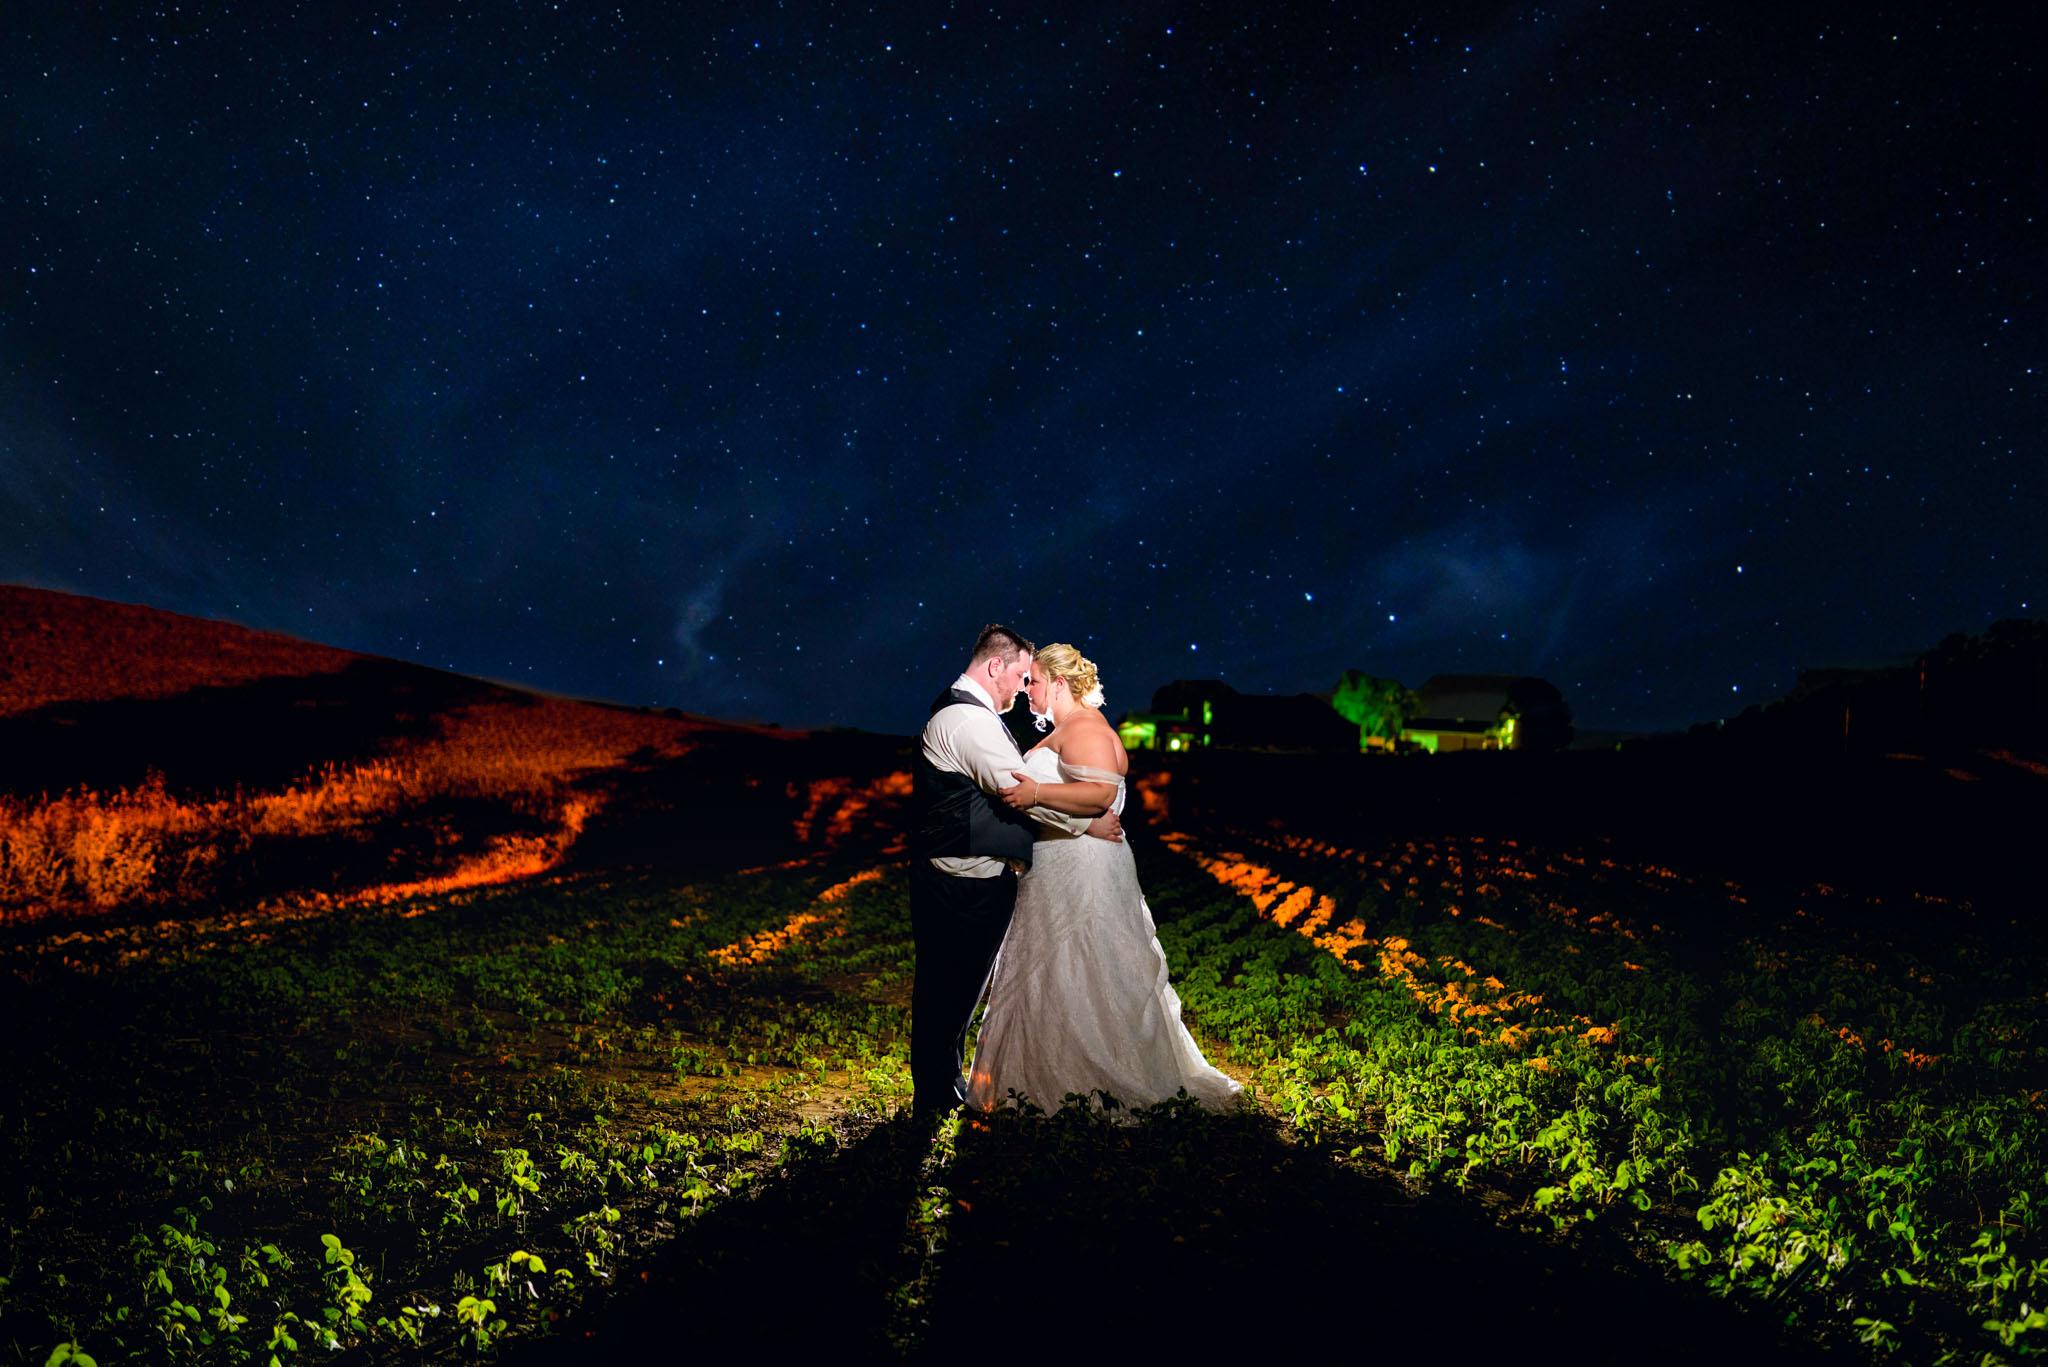 Country Wedding Mississauga Photographer Night Photography Outdoor Ceremony St Jacob S Sunset Three Bridges